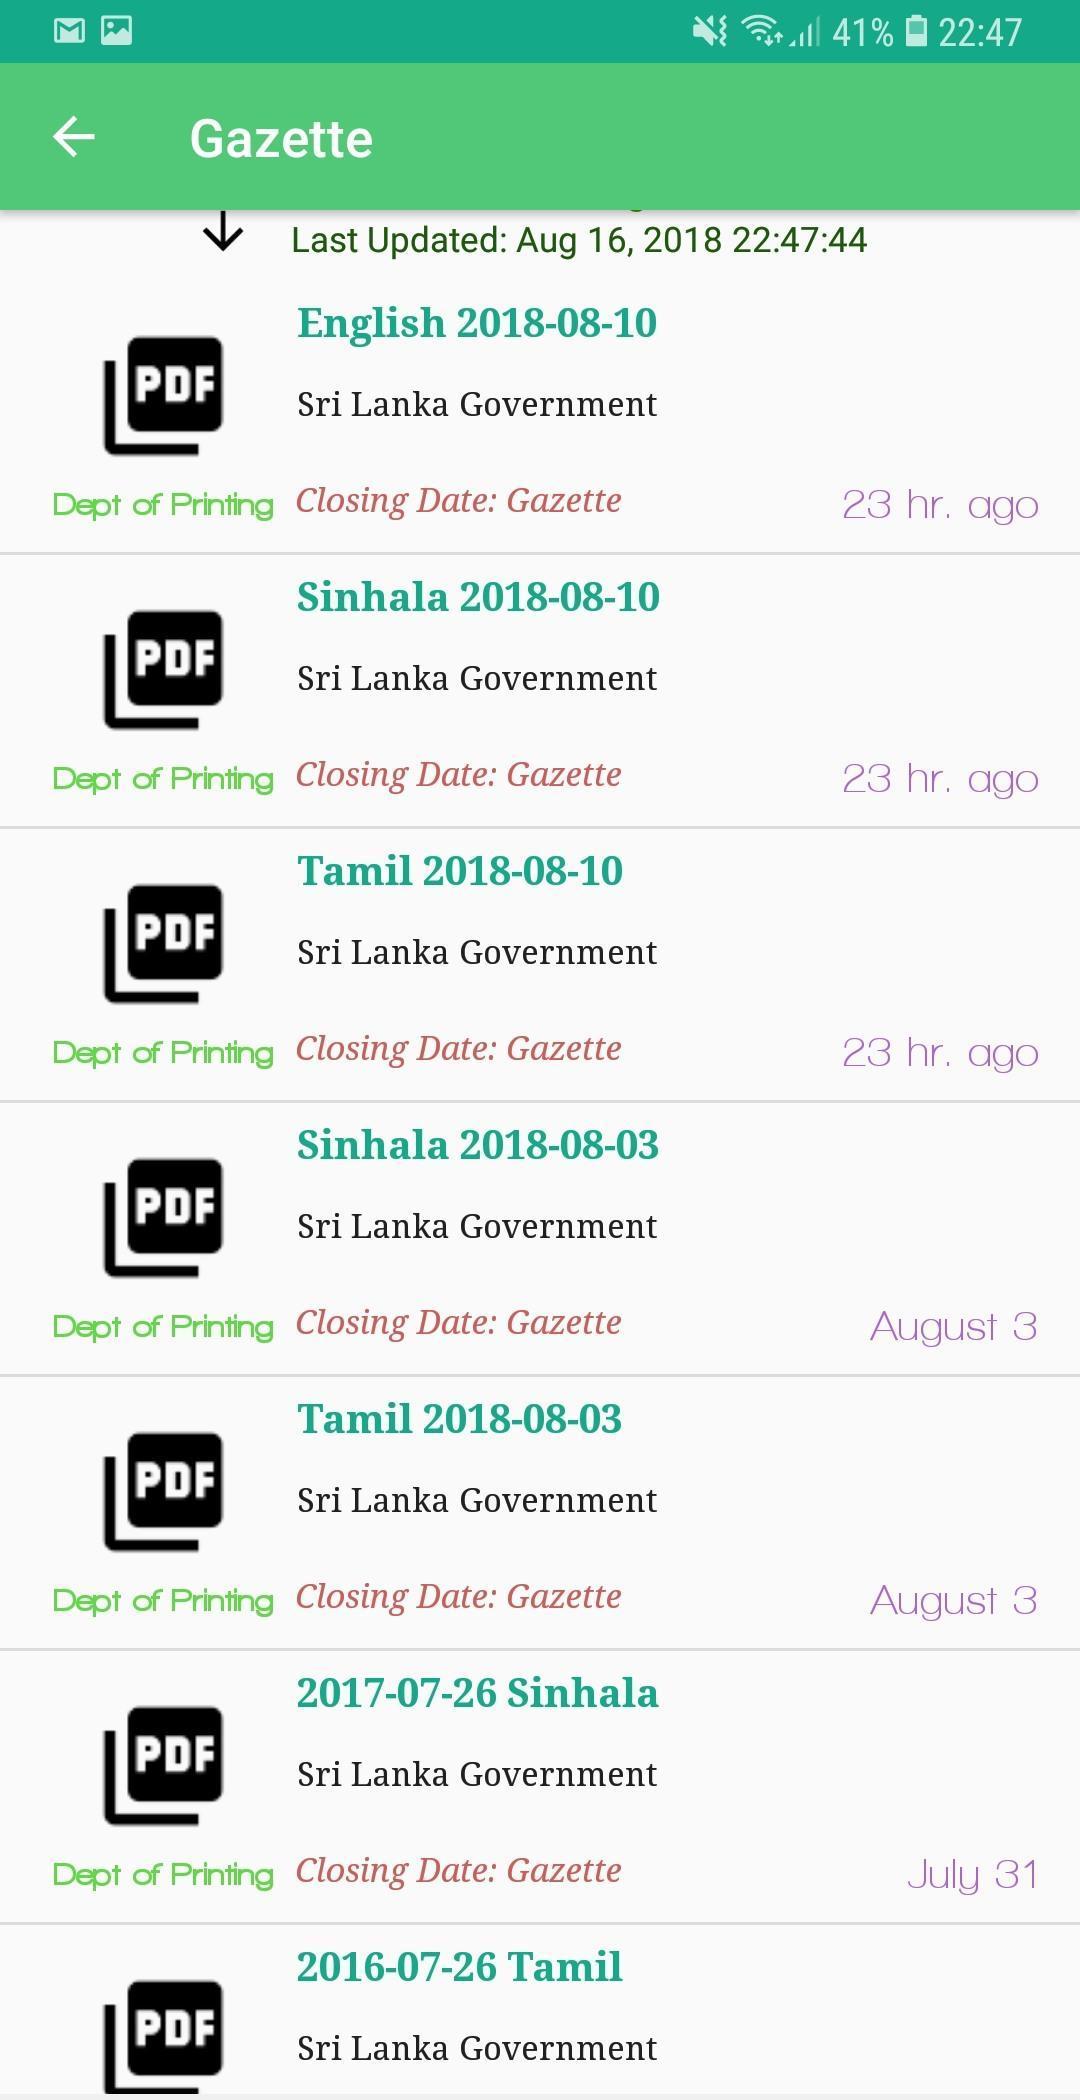 Sri Lanka Jobs & Gazette for Android - APK Download